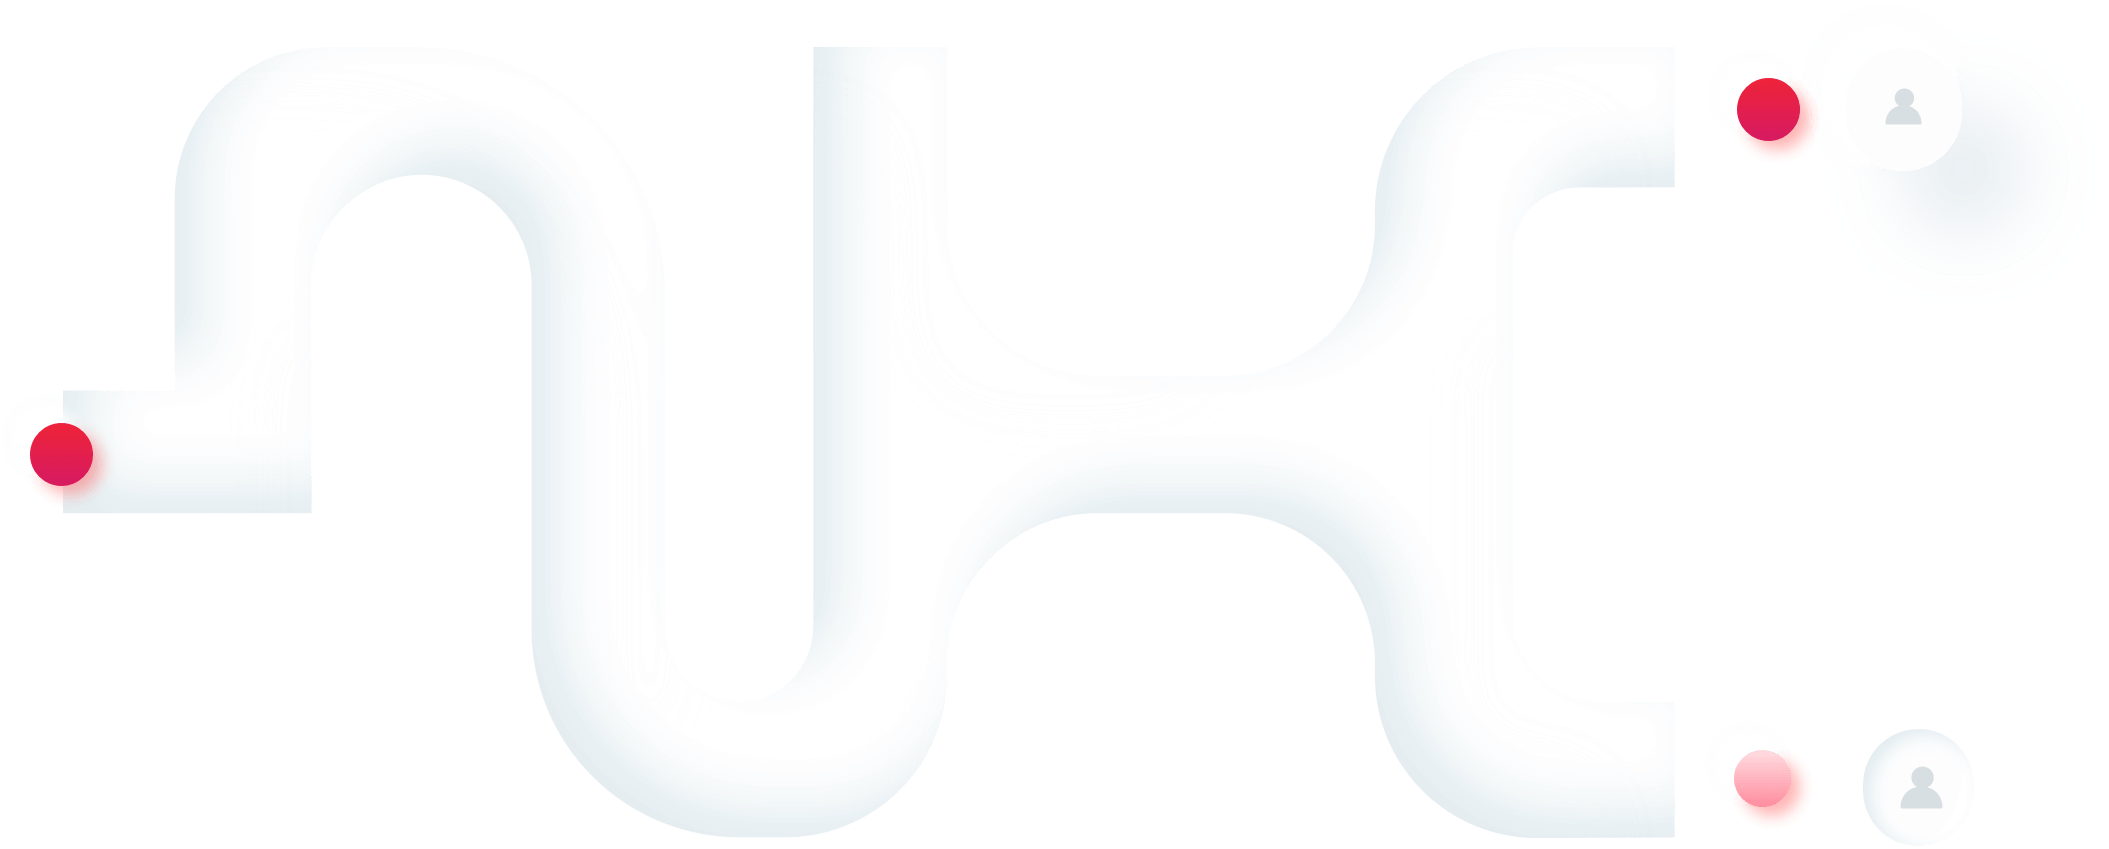 IT/DevOps stack